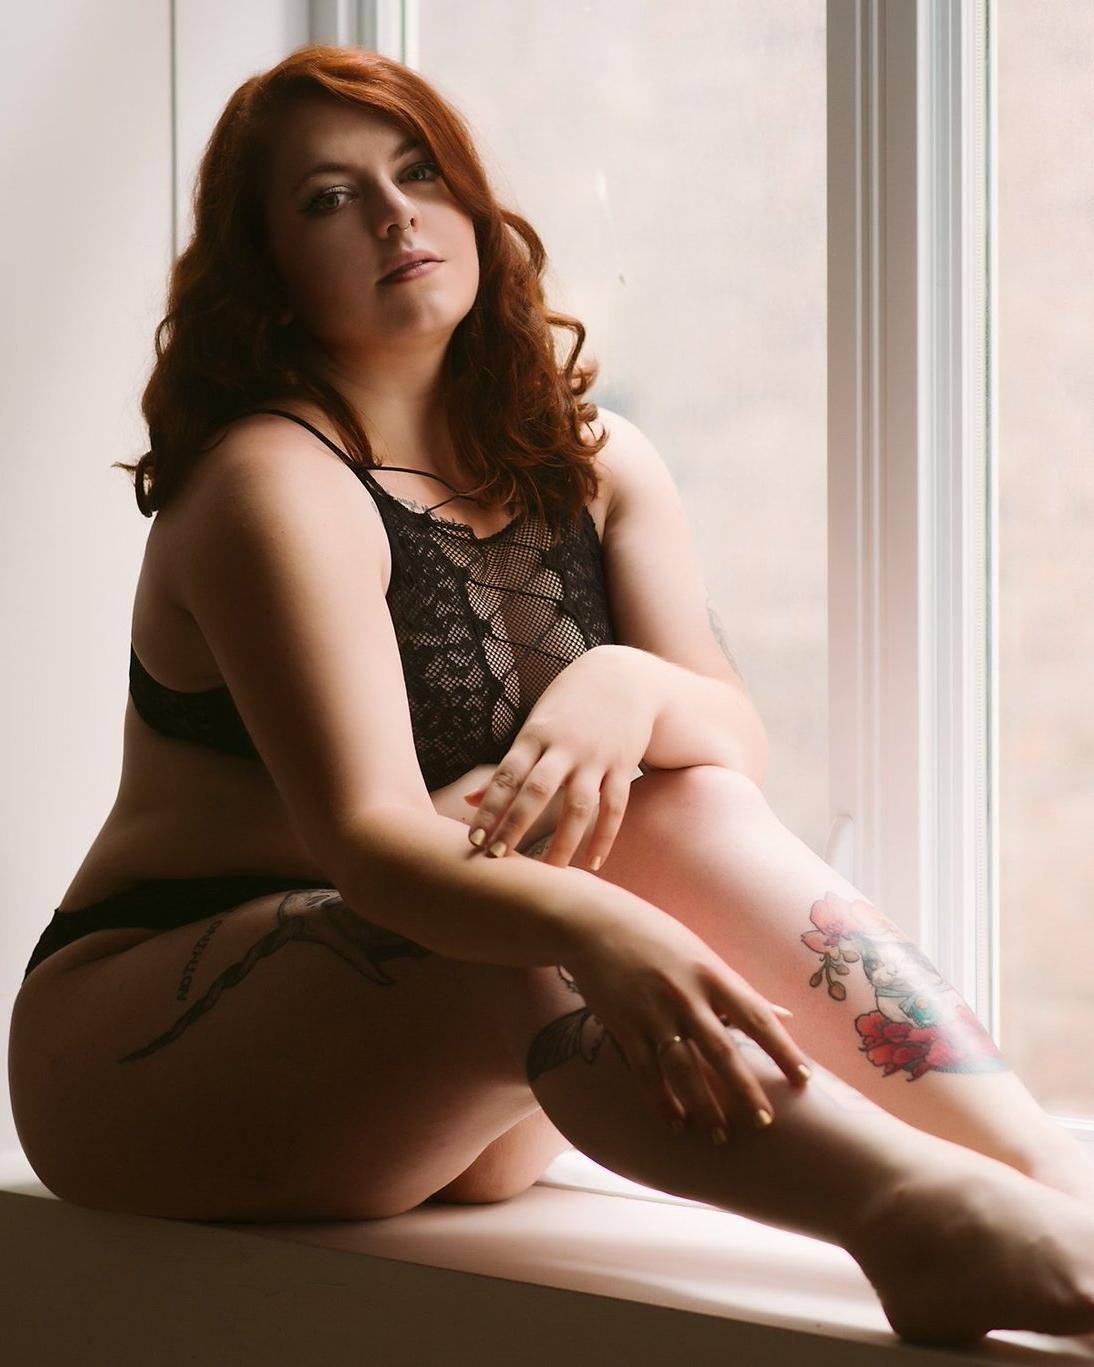 Charlotte Harley - Montreal